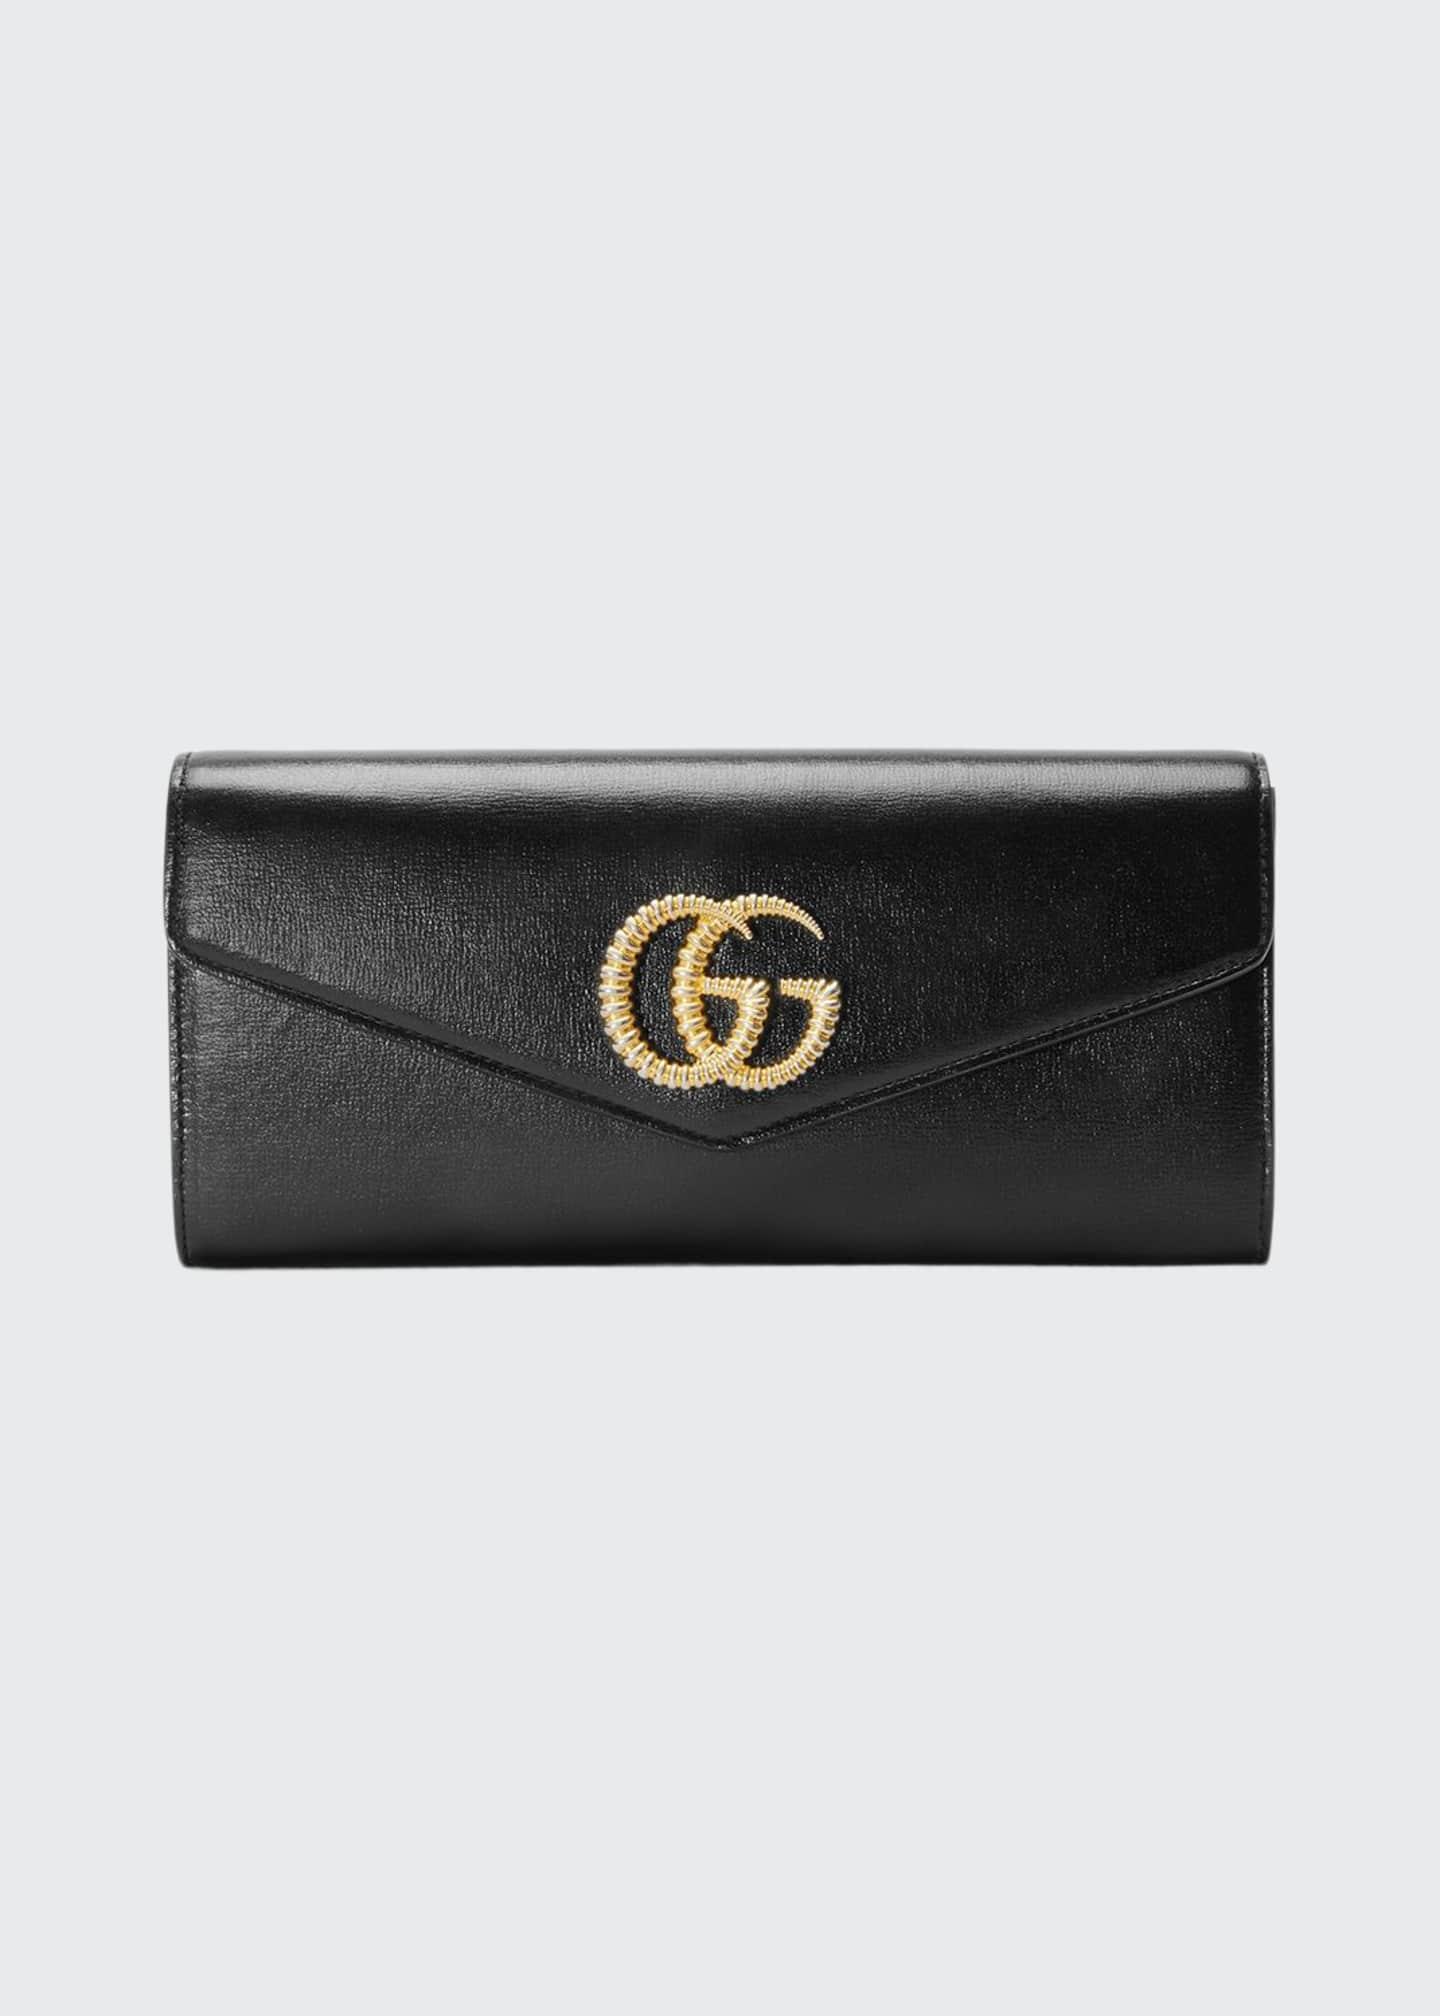 Gucci Broadway Small Evening Clutch Bag